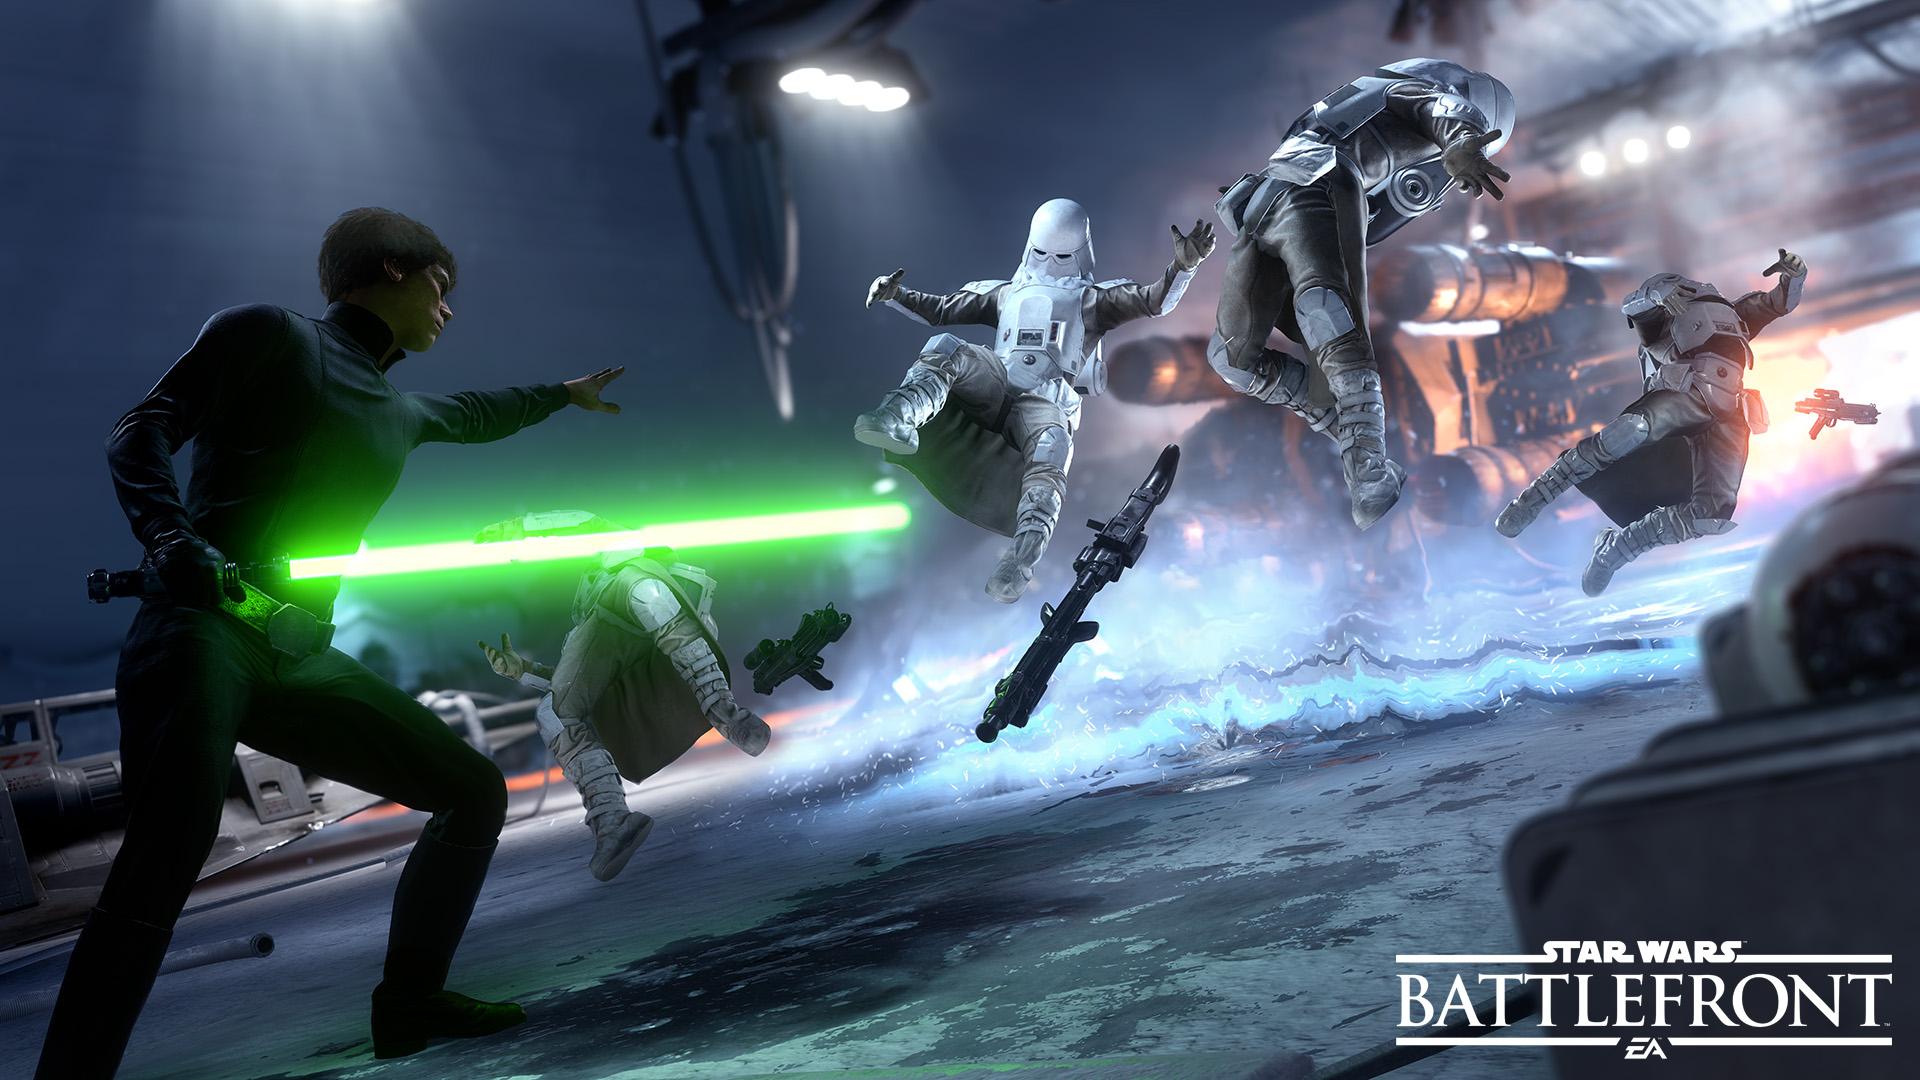 2885933-star_wars_battlefront_e3_screen_1_force_push_wm